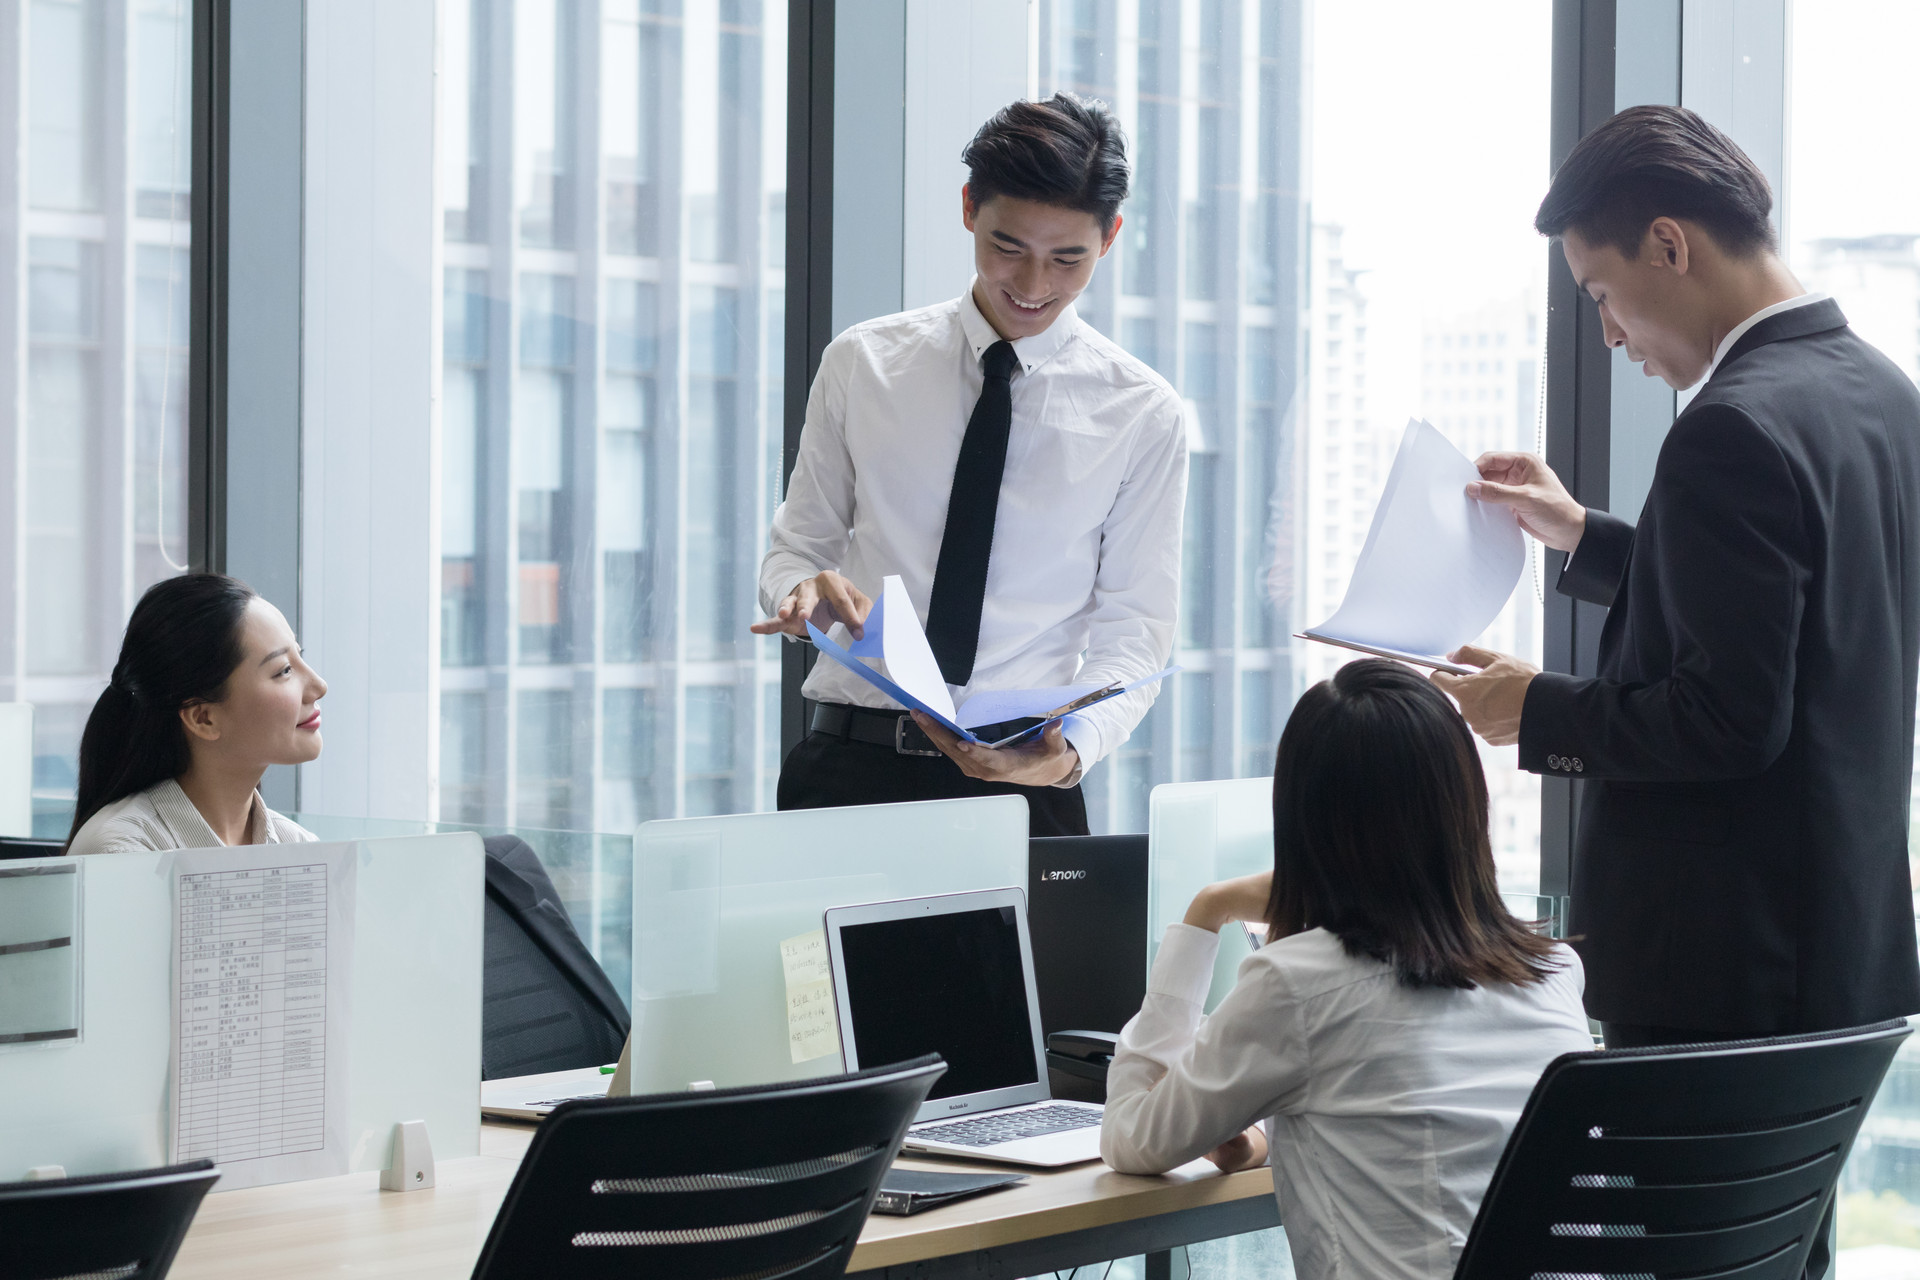 betvip365亚洲版官网,深圳betvip365亚洲版官网企业的优势,深圳betvip365亚洲版官网